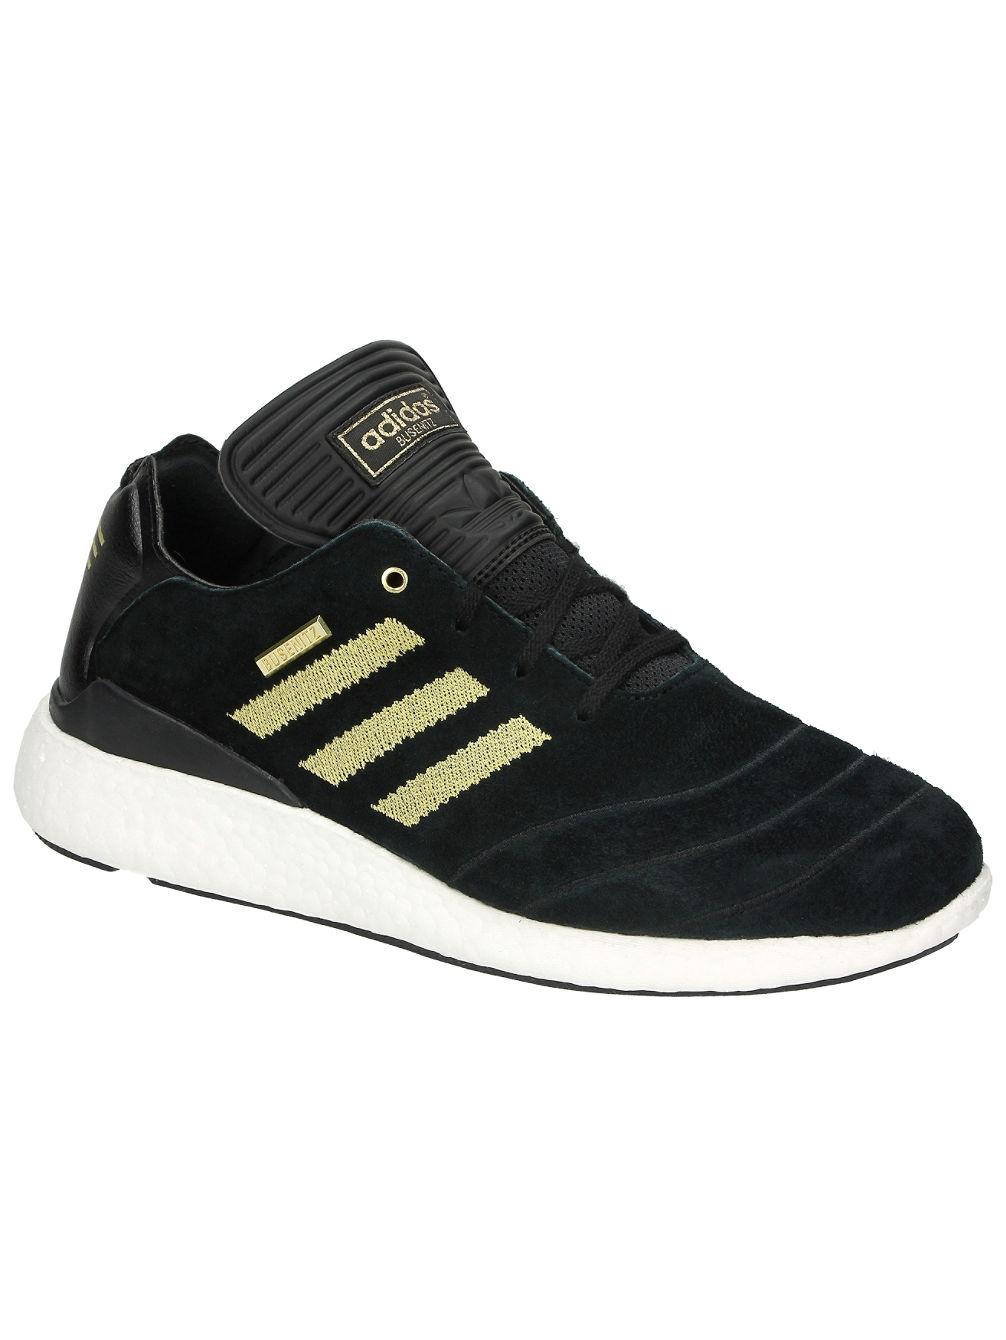 adidas-skateboarding-busenitz-pure-boost-10-yr-anni-skate-shoes